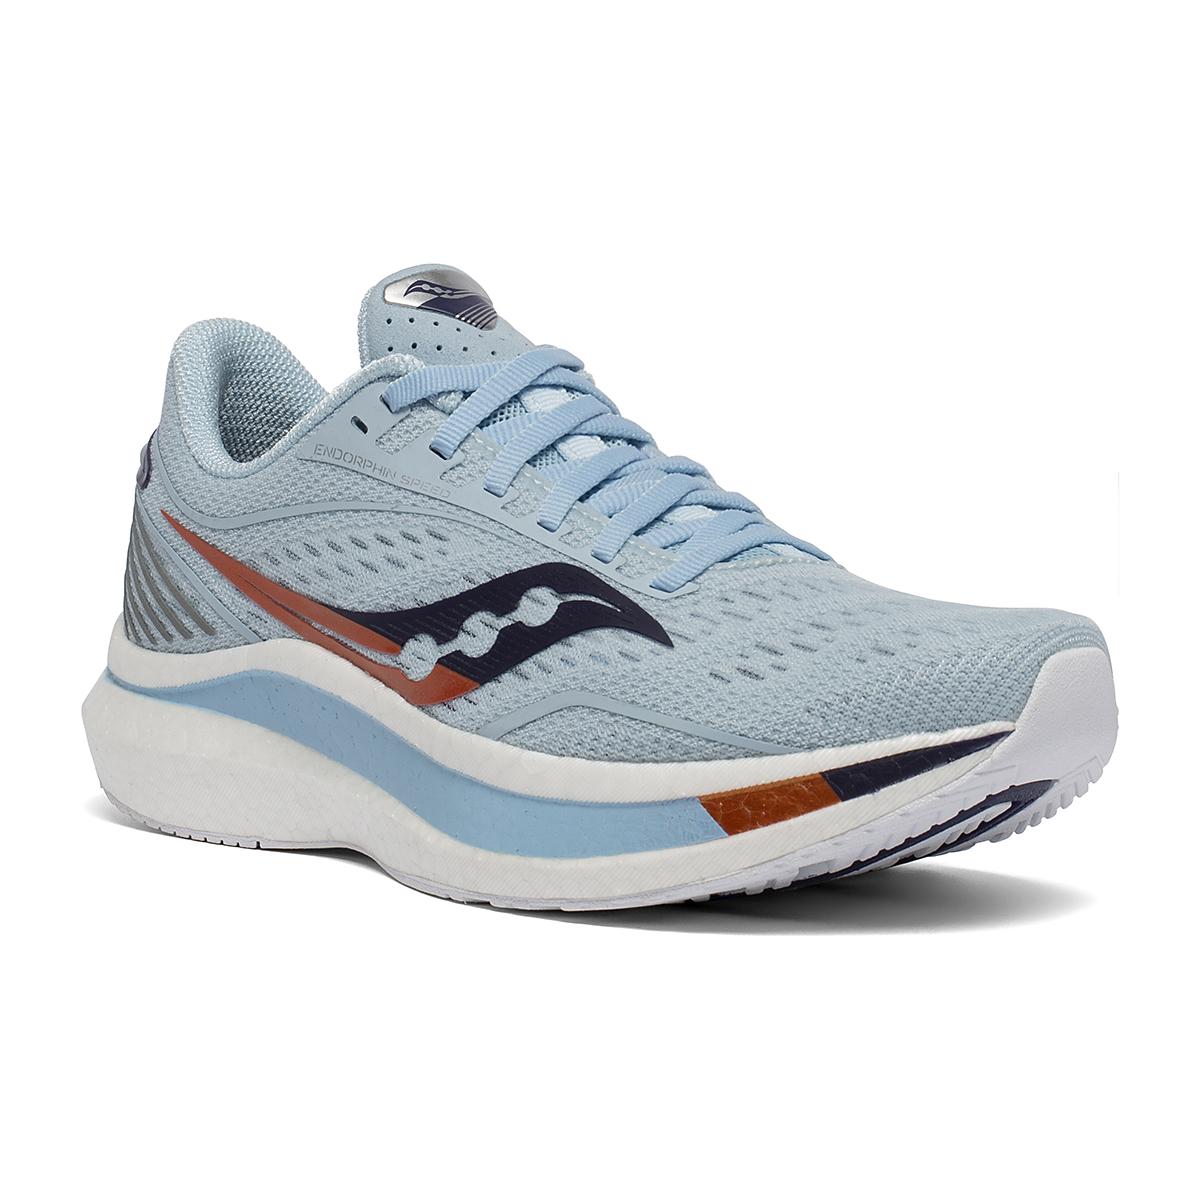 Women's Saucony Endorphin Speed Running Shoe - Color: Sky/Midnight - Size: 8.5 - Width: Regular, Sky/Midnight, large, image 5